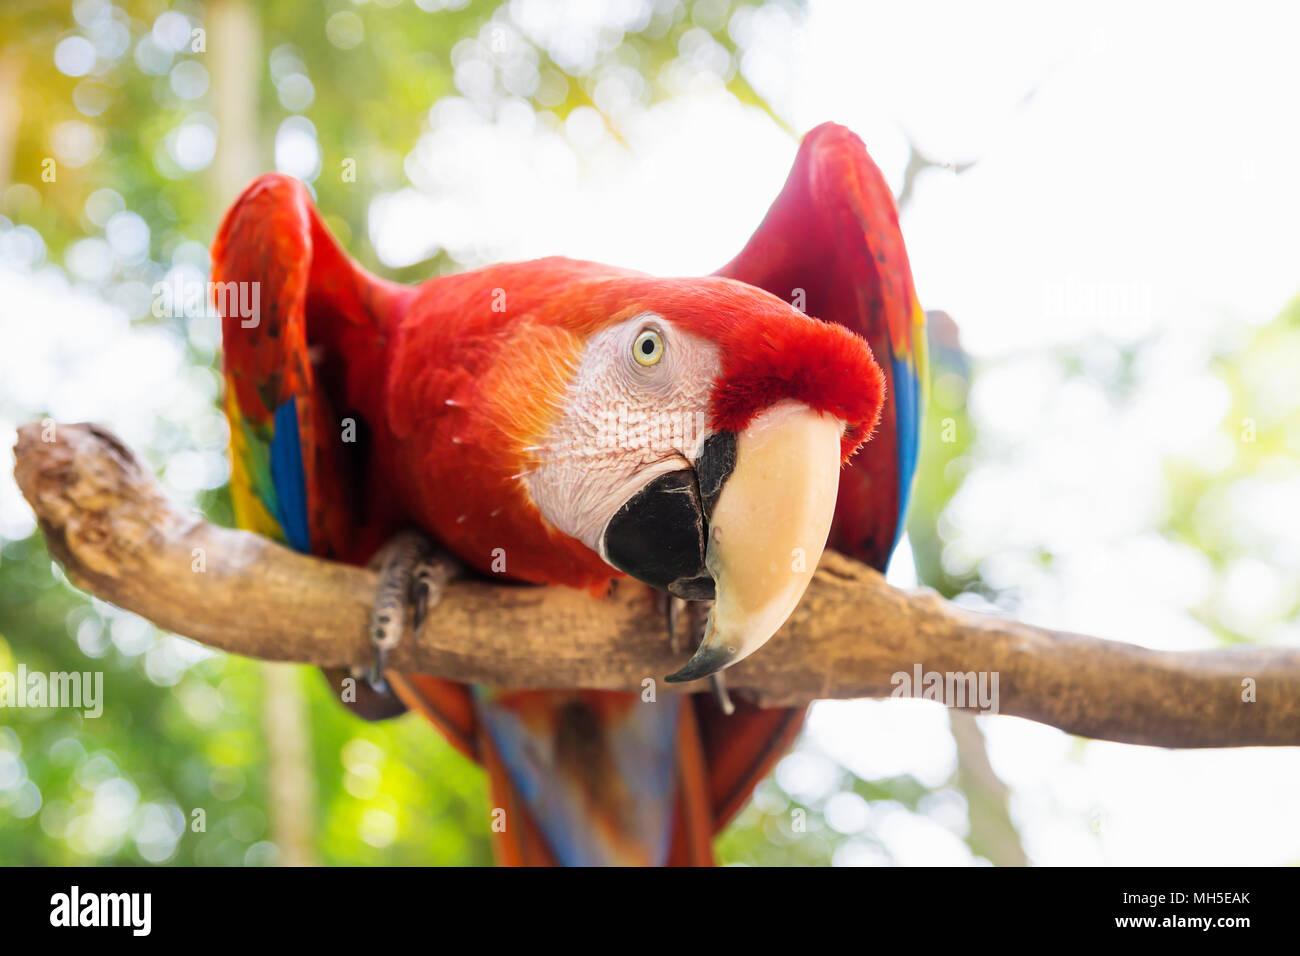 Scarlett Macaw bird parrot guardando curioso in Macaw Mountain, Copan Ruinas, Honduras, America Centrale Immagini Stock